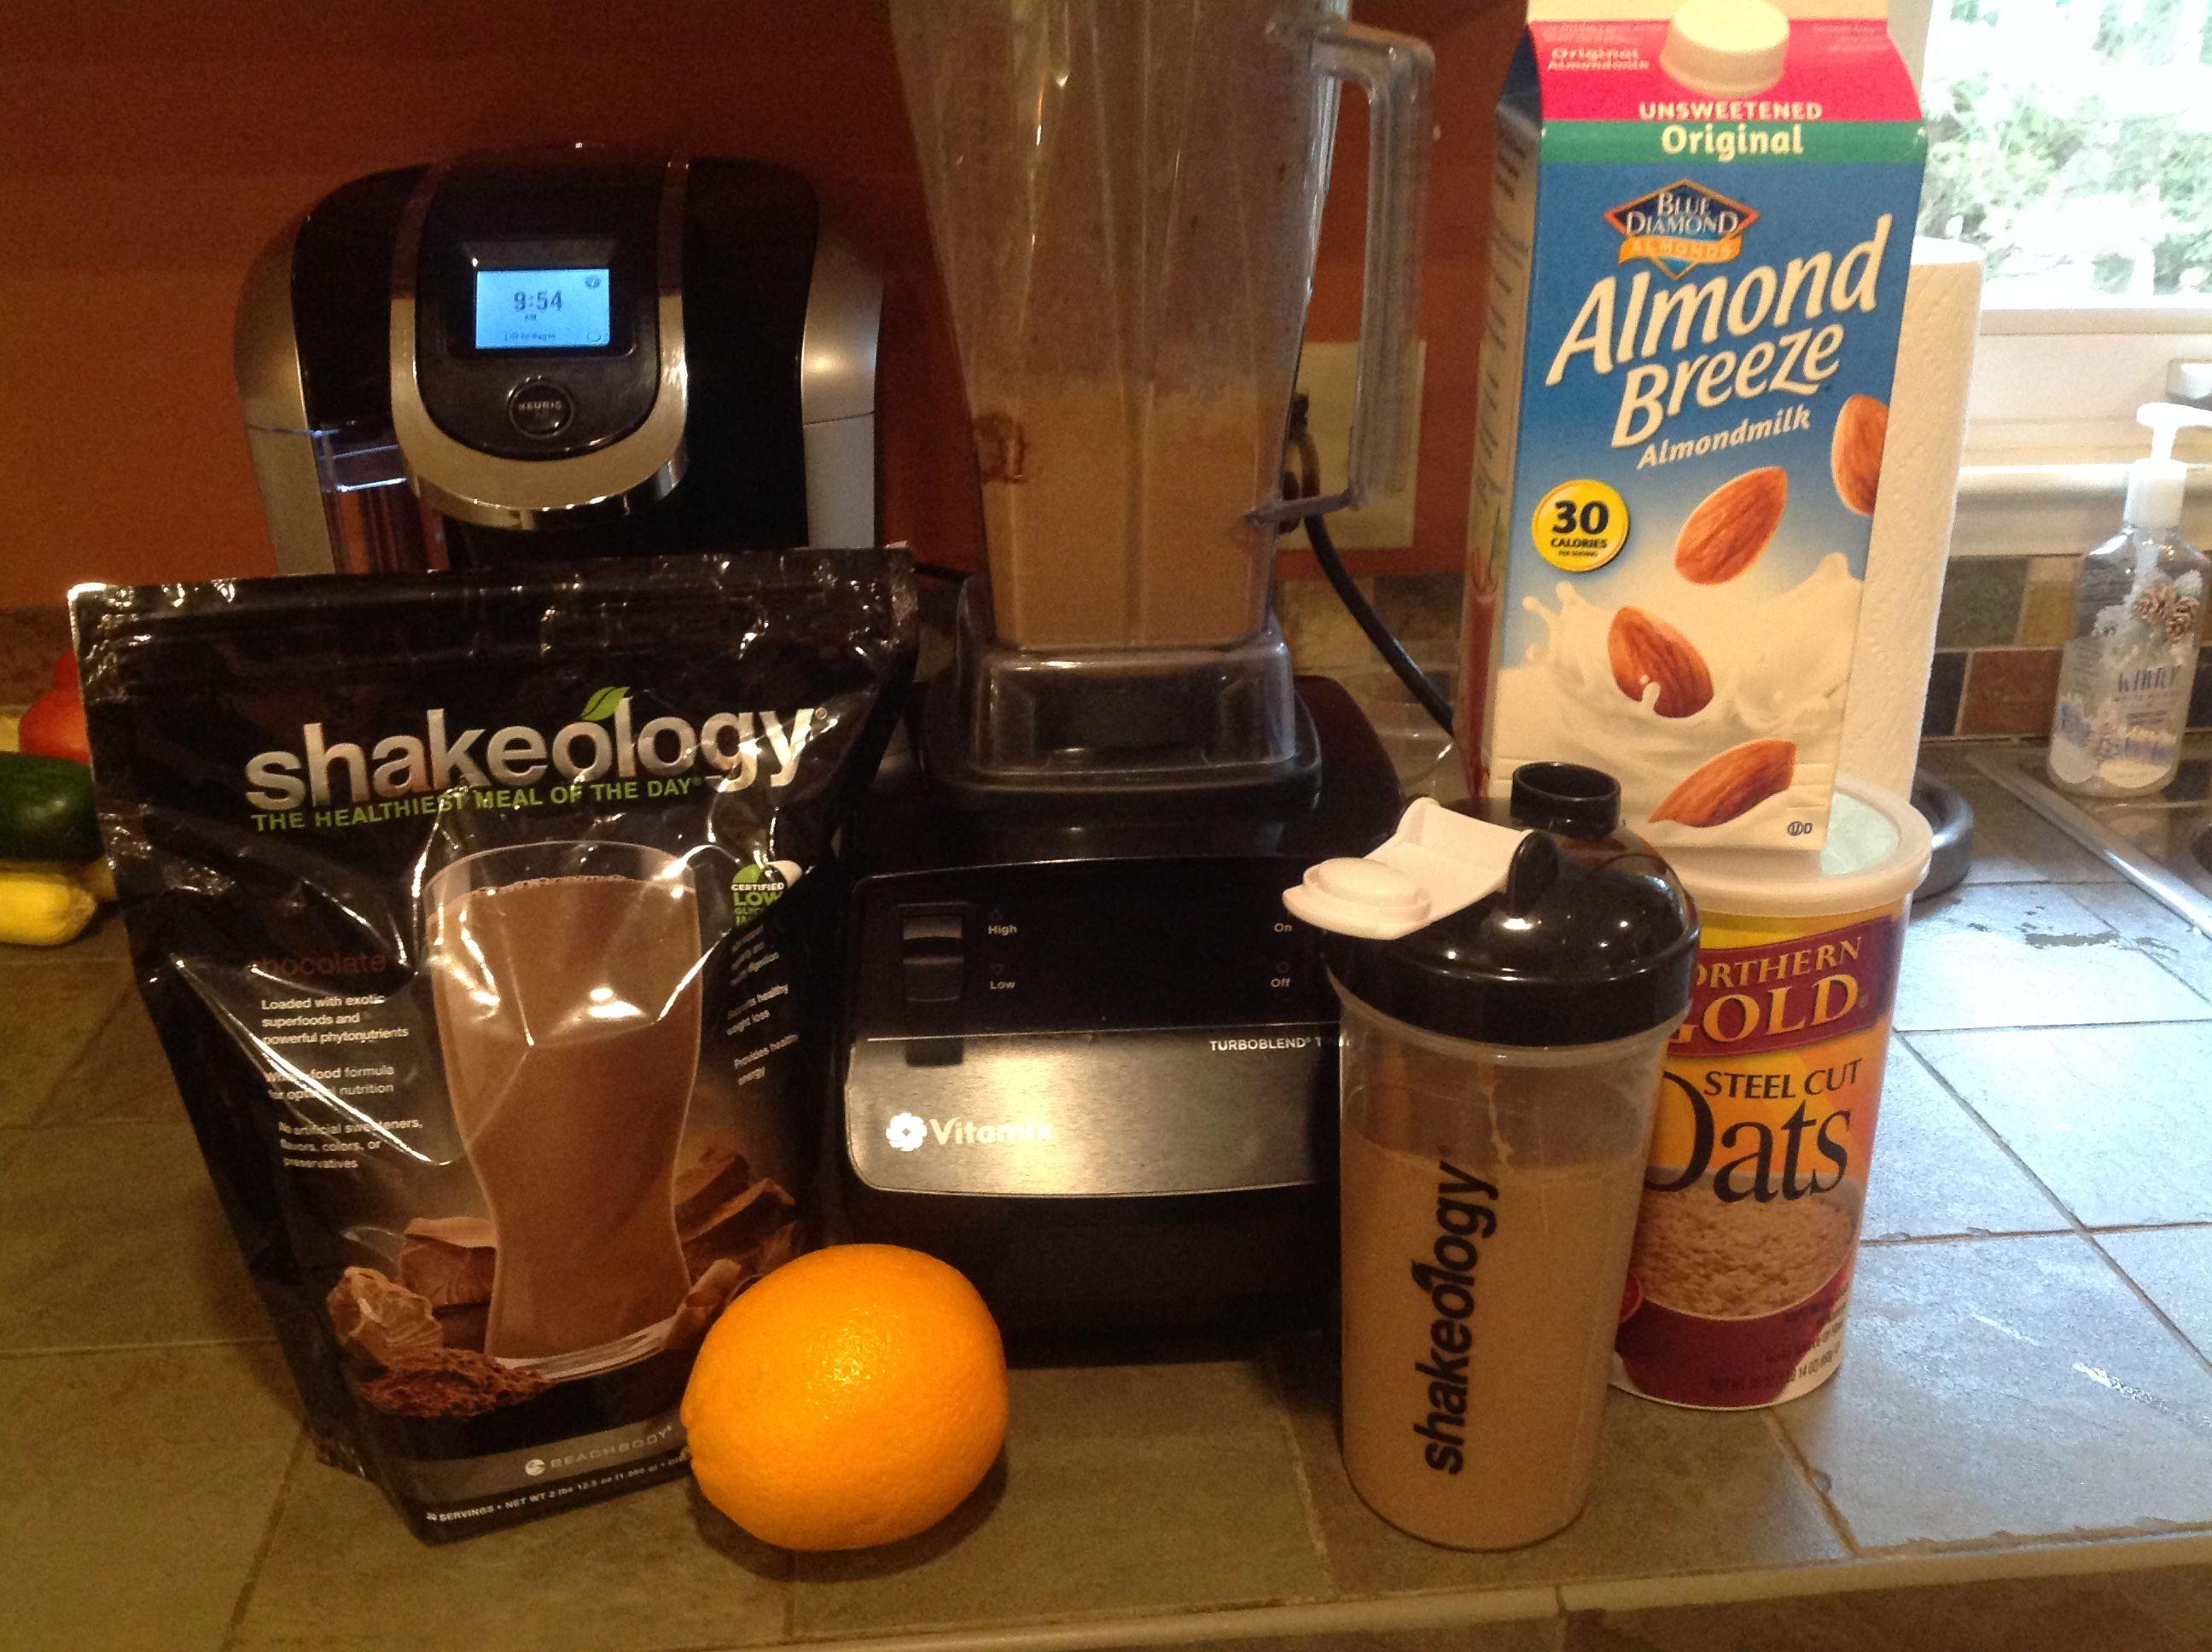 Chocolate Shakeology, Unsweetened Almond Milk, 1 tblsn raw steel cut oats, 1/2 frozen Orange